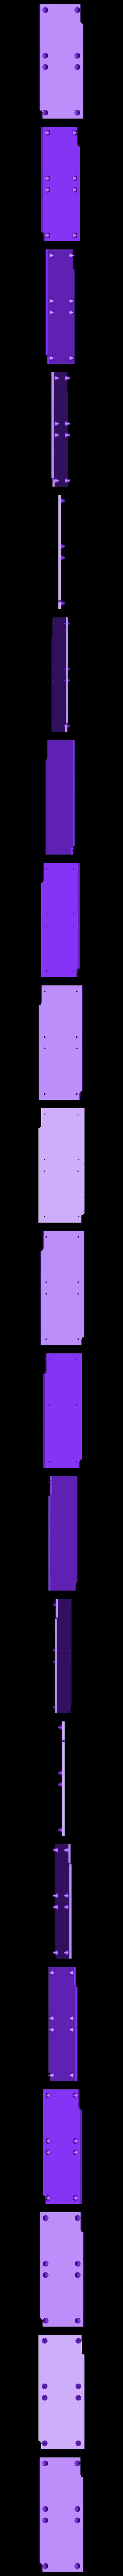 mosfetv1.1.stl Download free STL file mosfet i3 mega • Model to 3D print, buched